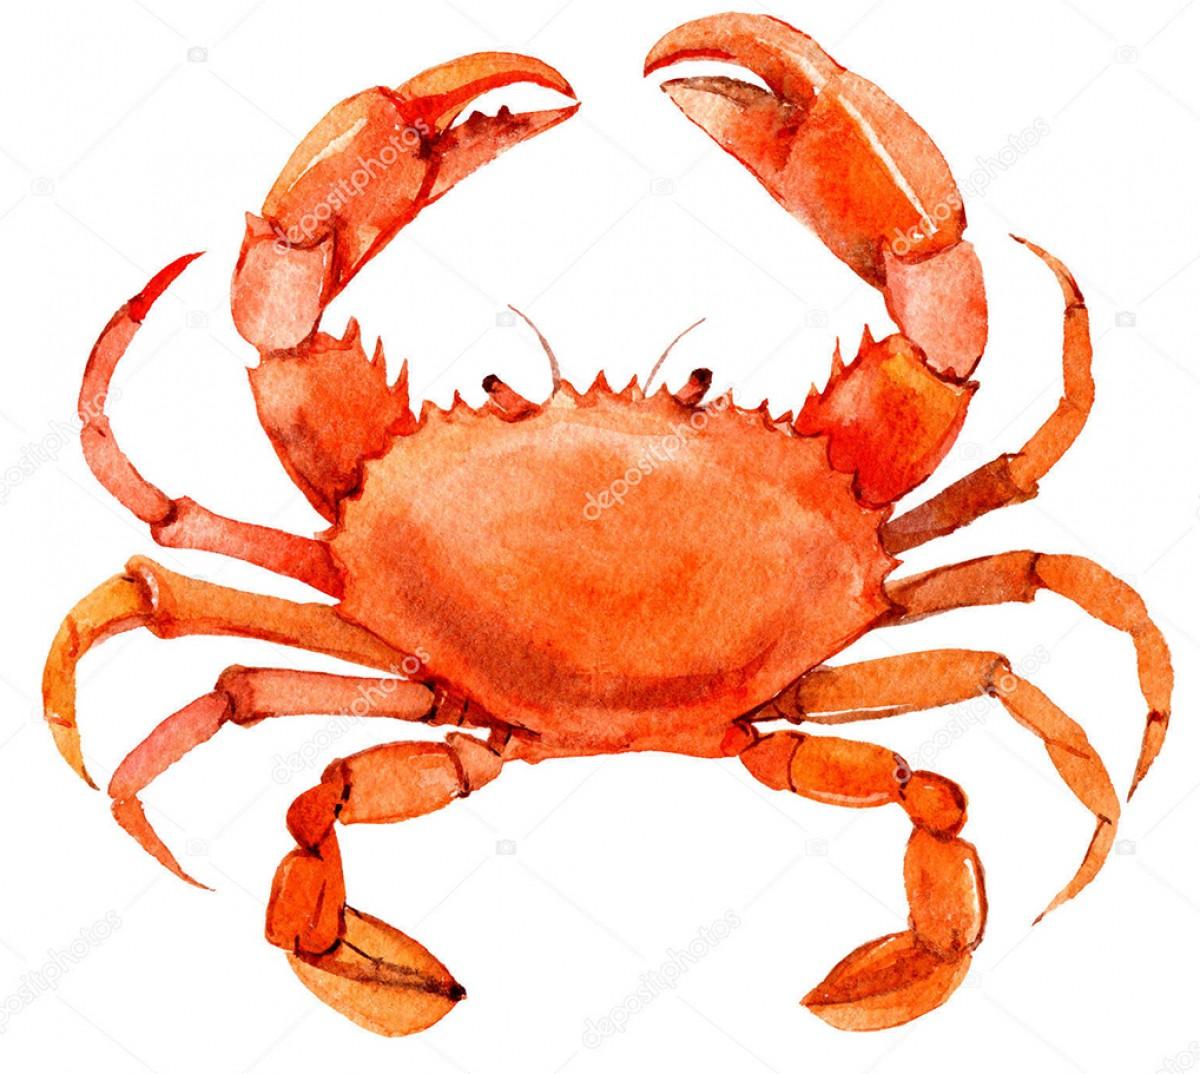 Category Crab 螃蟹